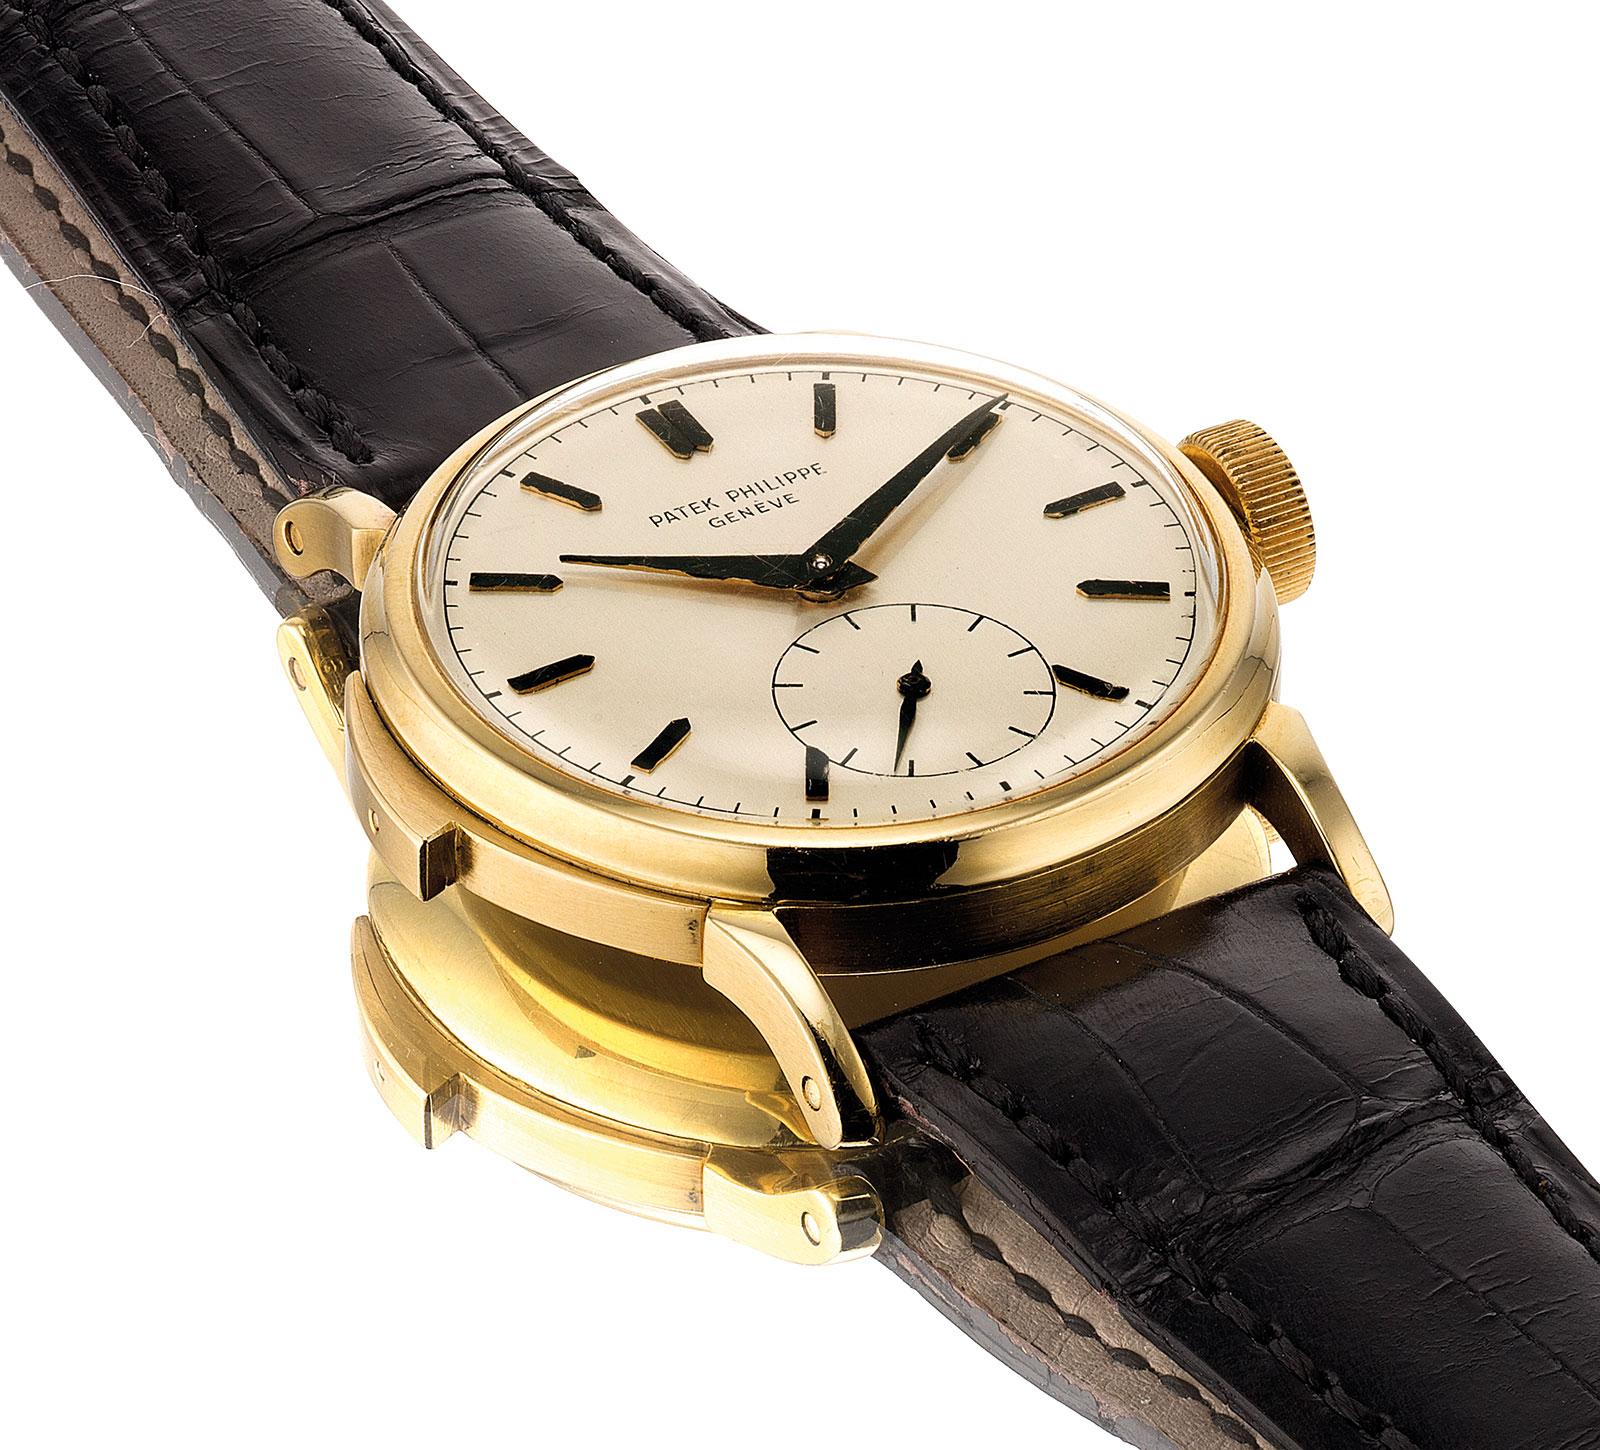 Patek Philippe 2419 minute repeater Cartier 2